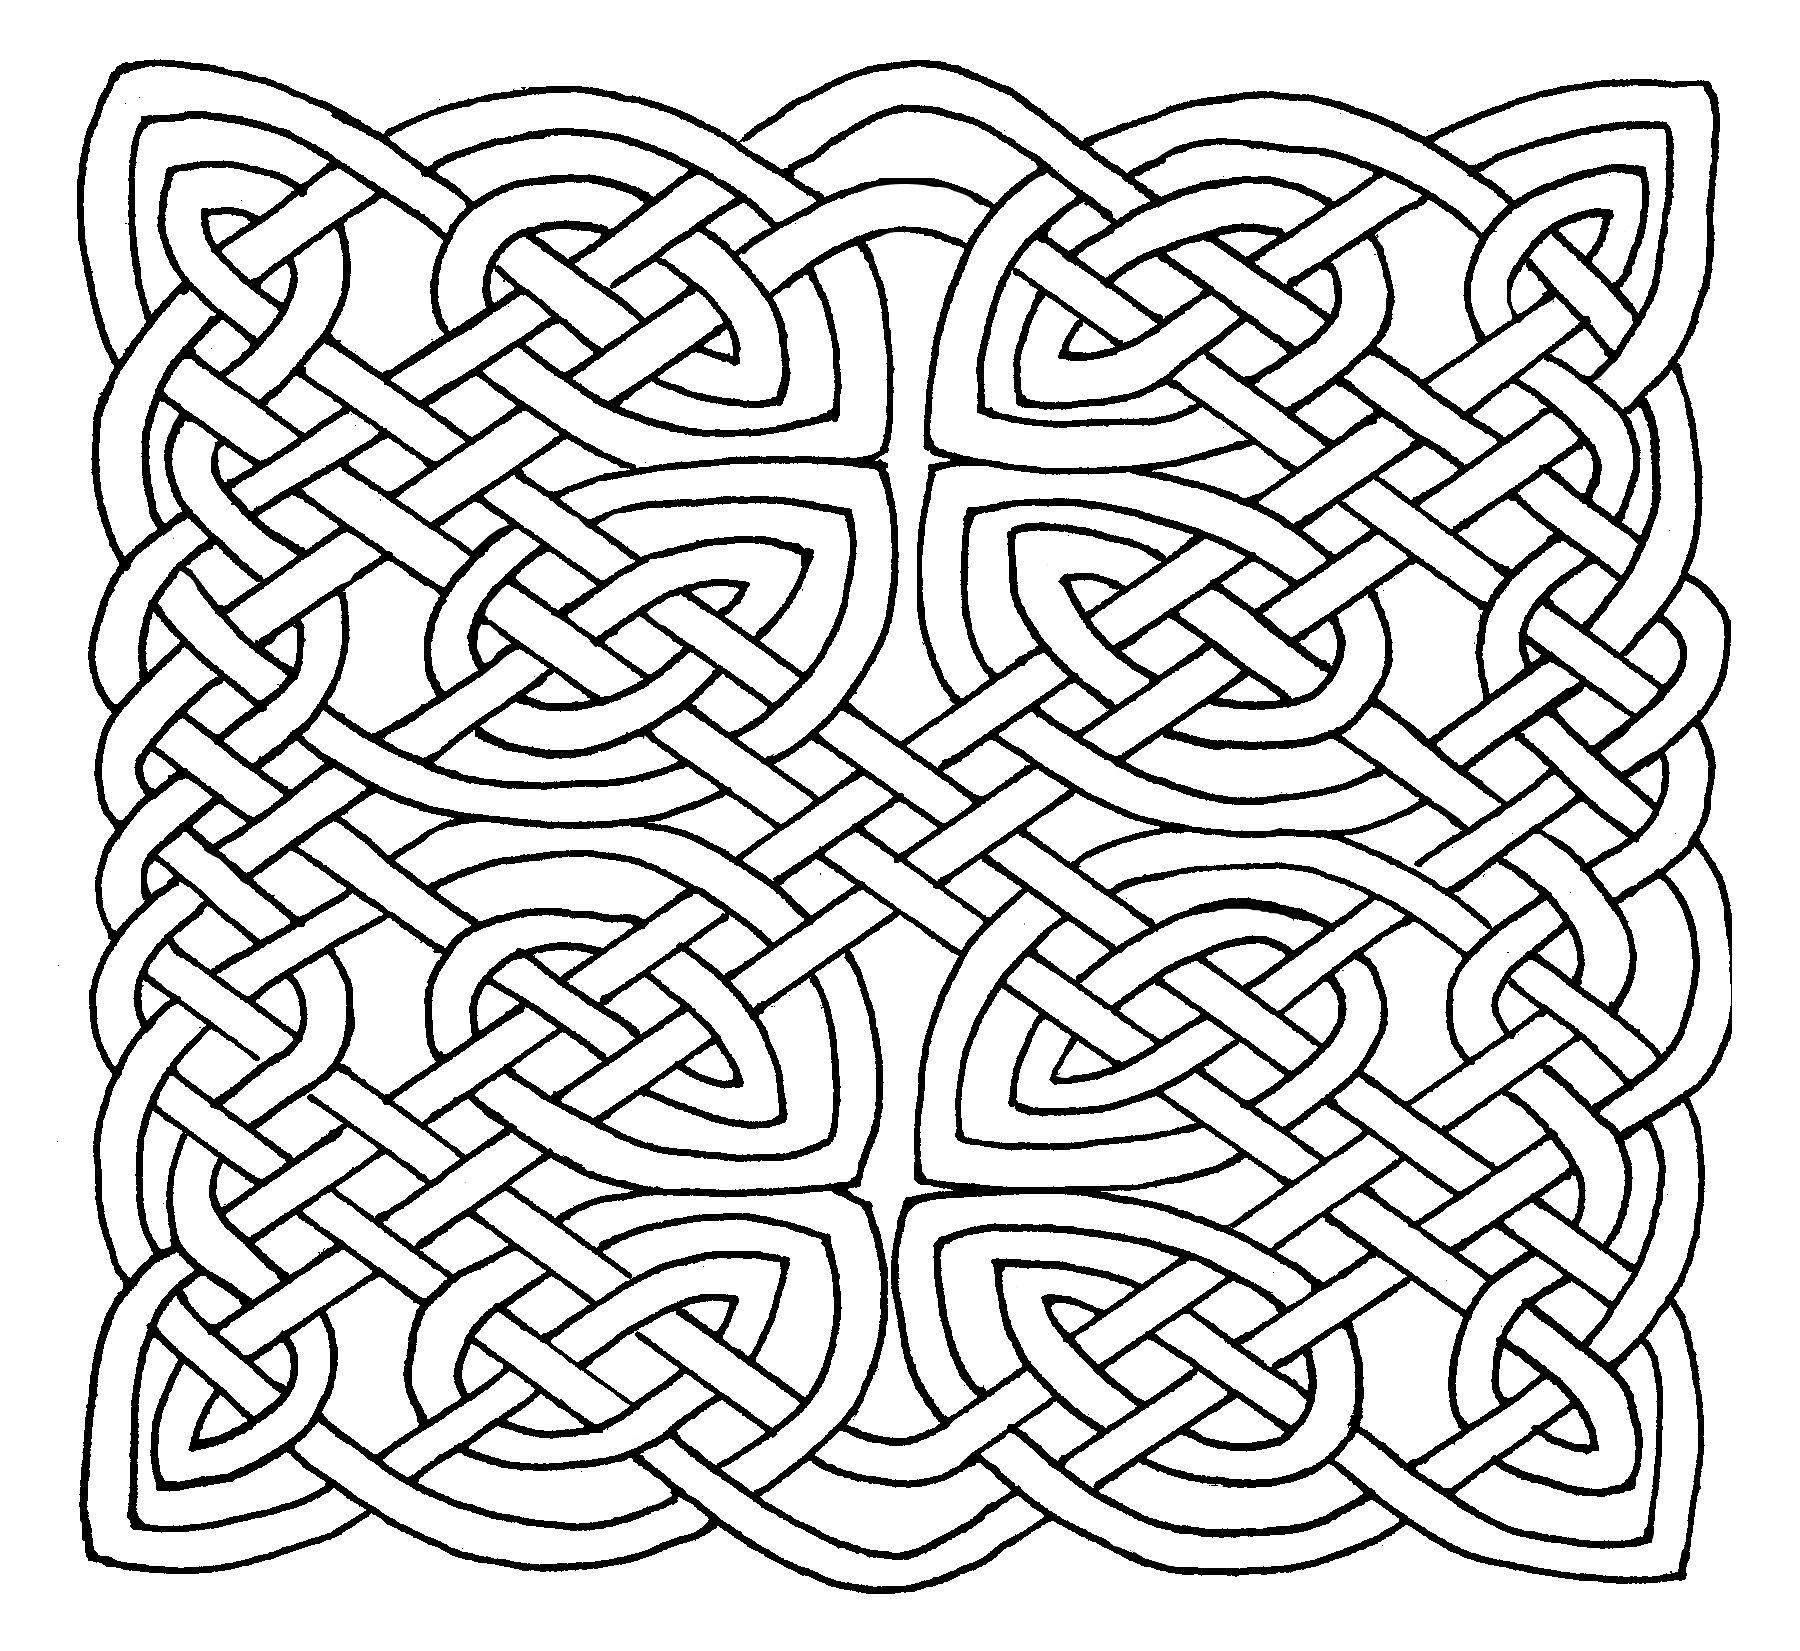 celtic patterns - Google Search | MANDALAS | Pinterest | Mandalas